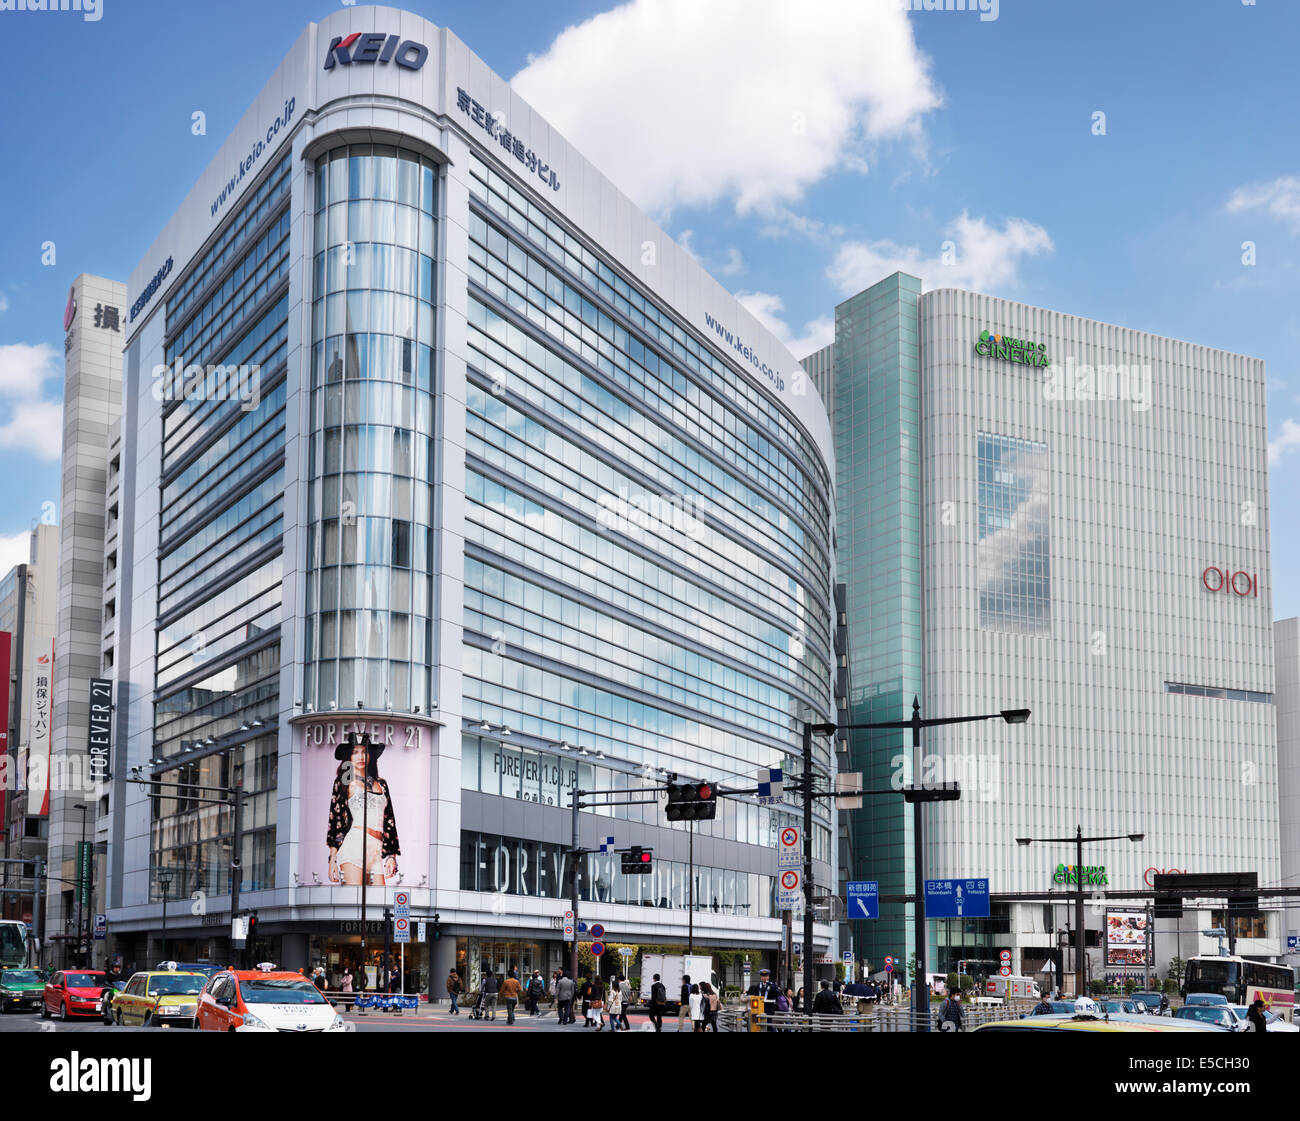 Forever 21 store building in Shinjuku, Tokyo, Japan 2014. - Stock Image